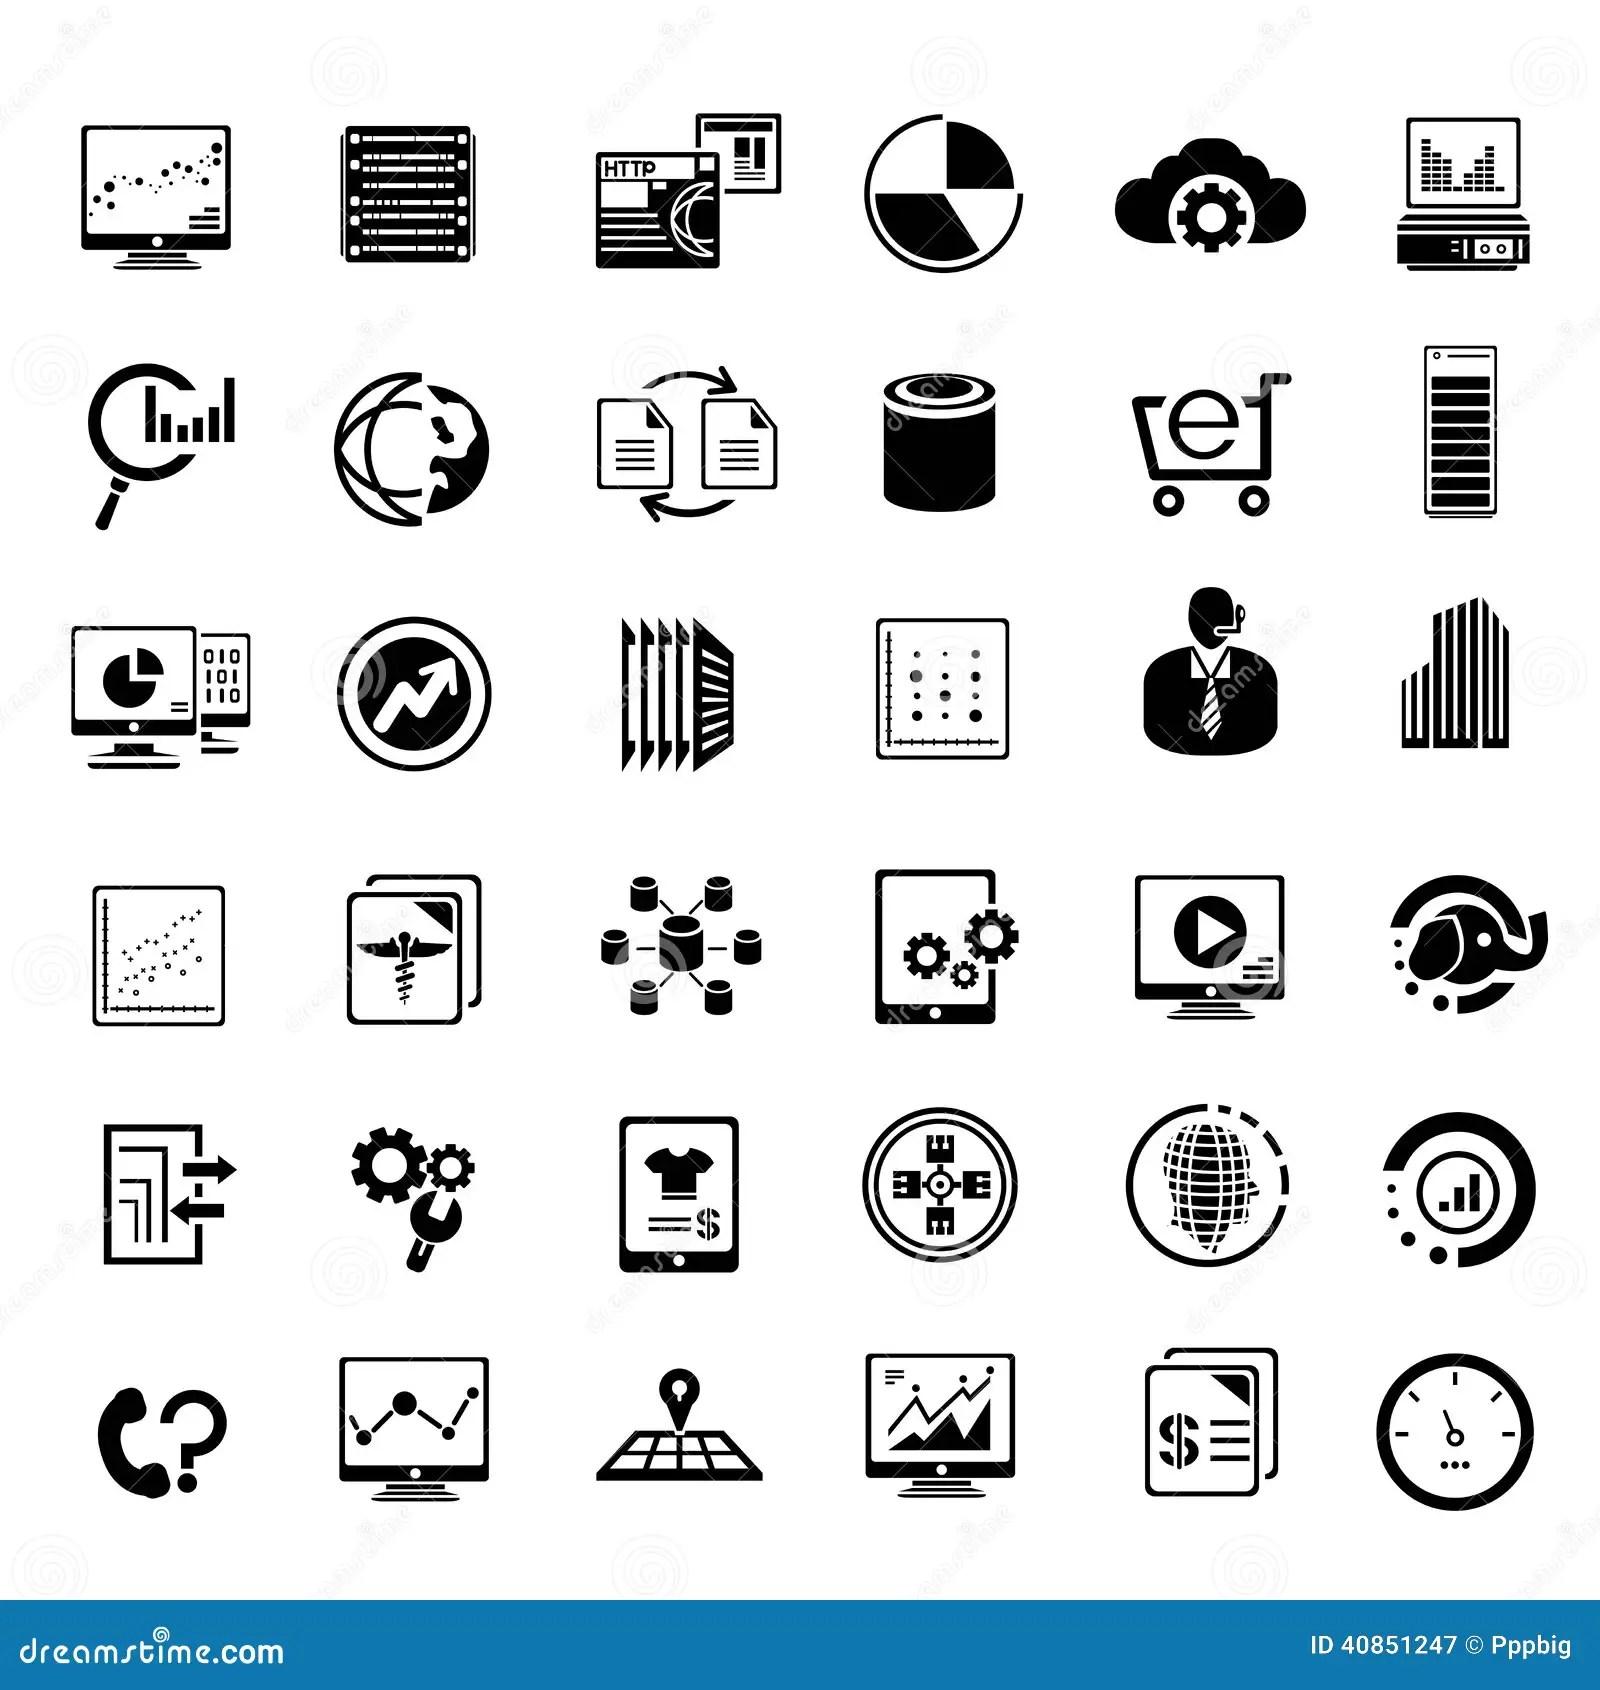 Big Data And Dataytics Icons Stock Illustration